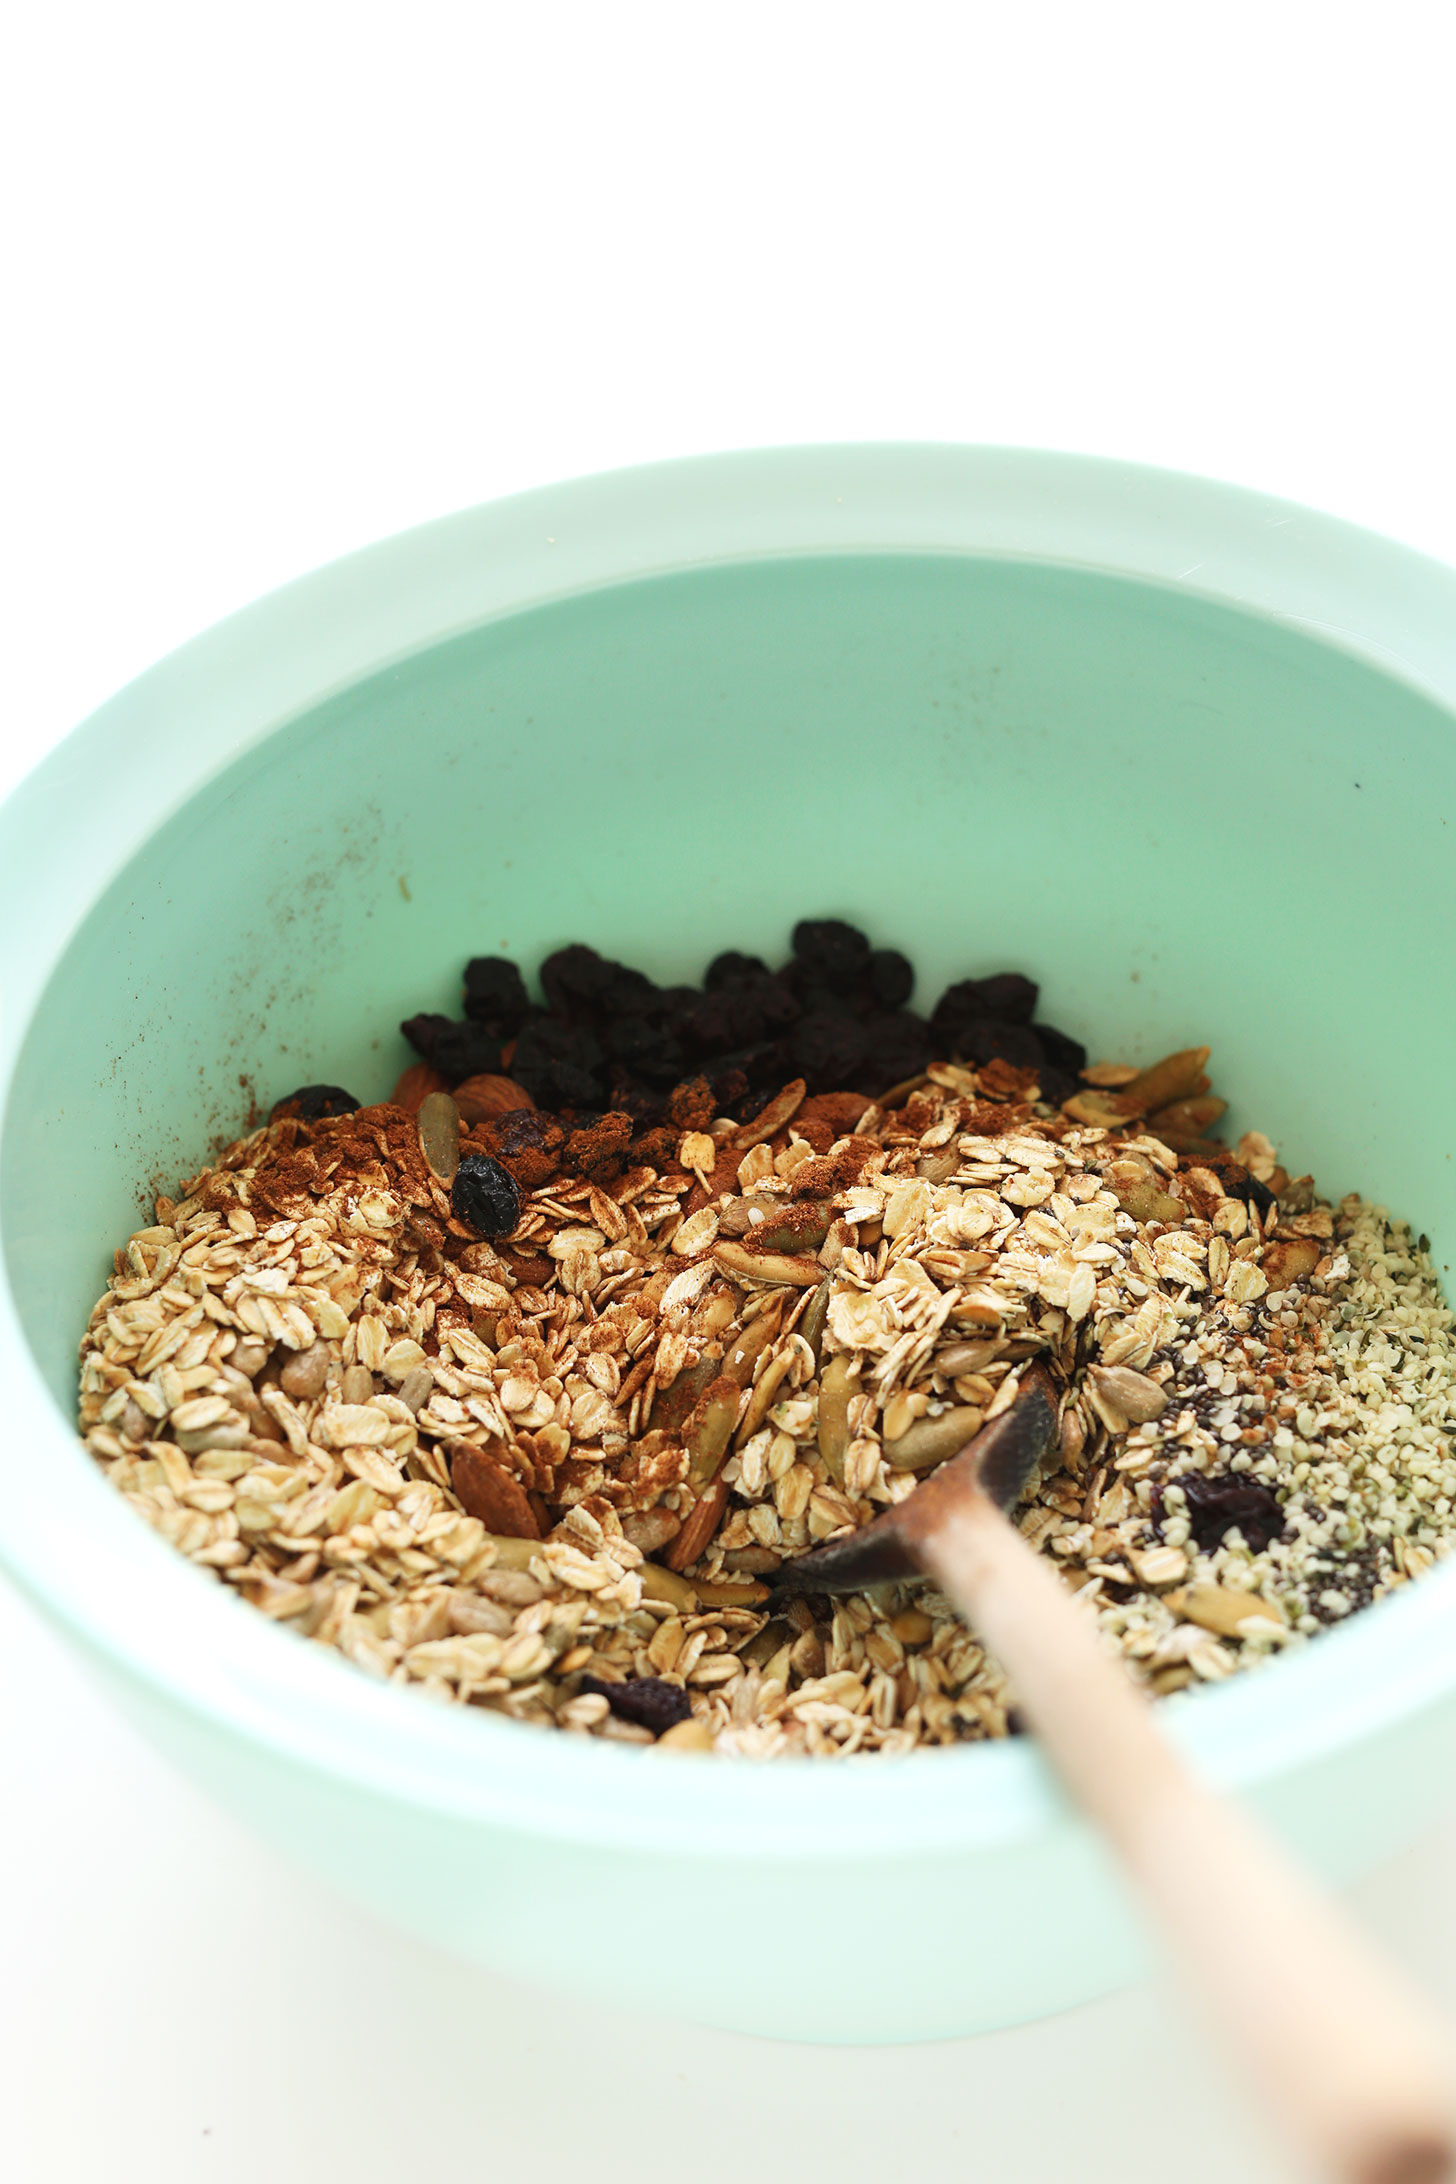 Stirring together ingredients for gluten-free vegan Toasted Pumpkin Muesli